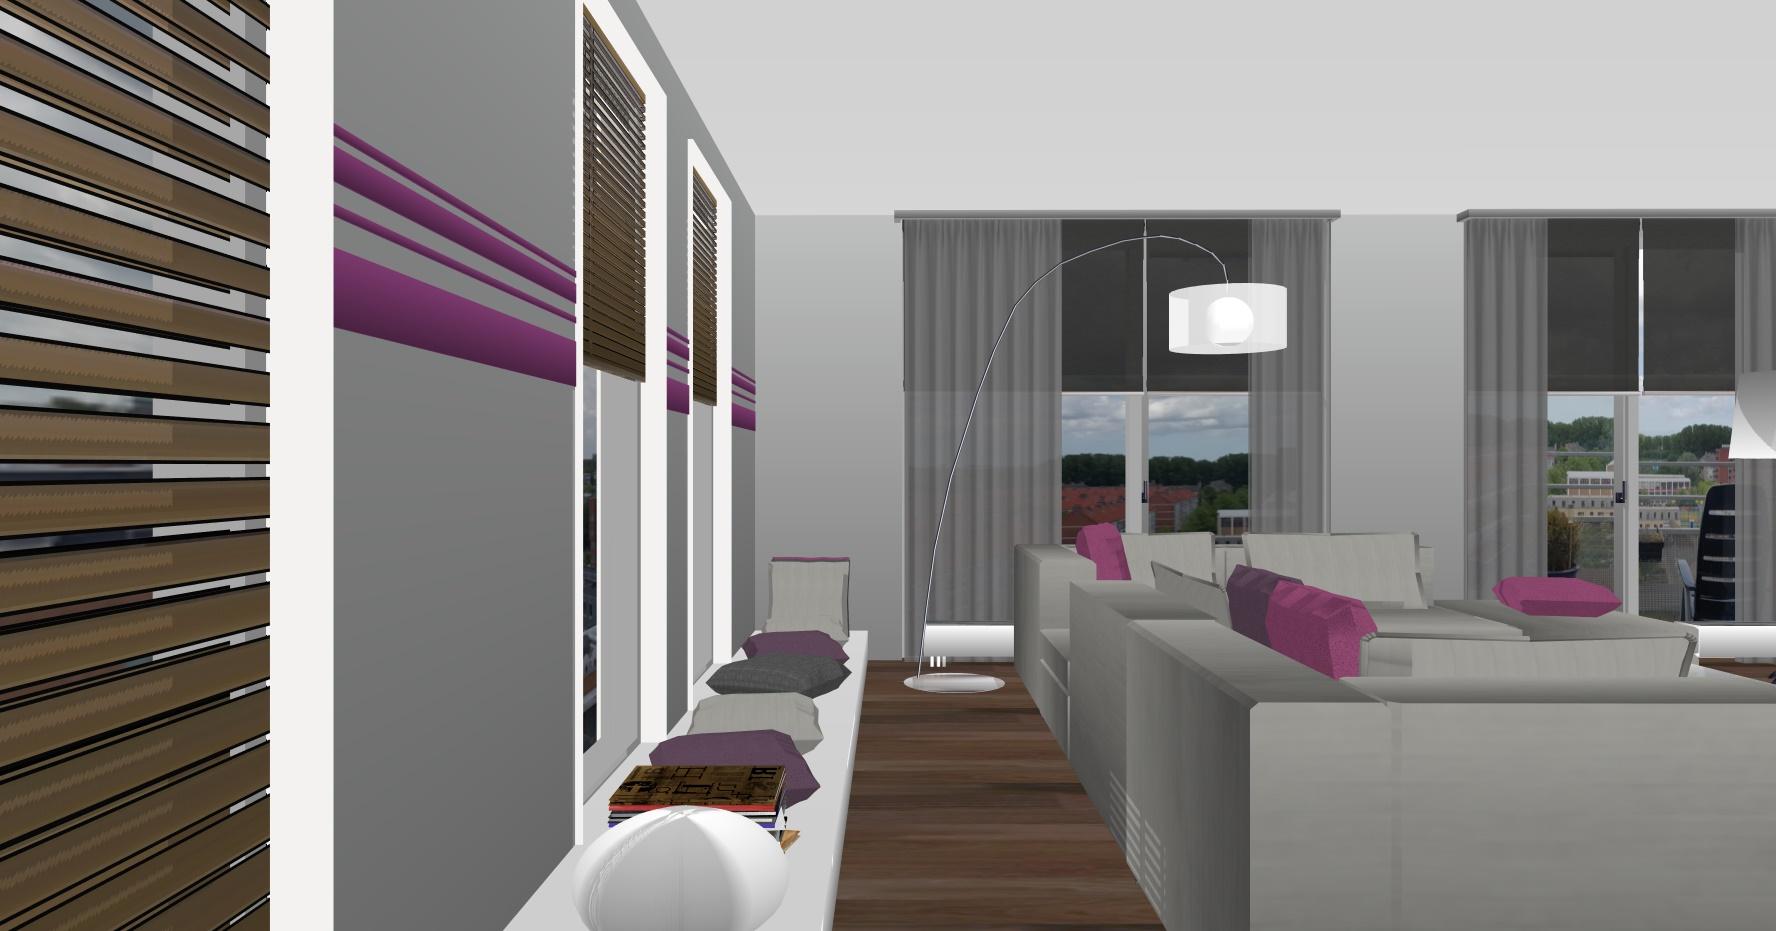 Badkamer Ontwerpen Ipad : Badkamer ontwerpen met baderie ontwerp programma u water vuur